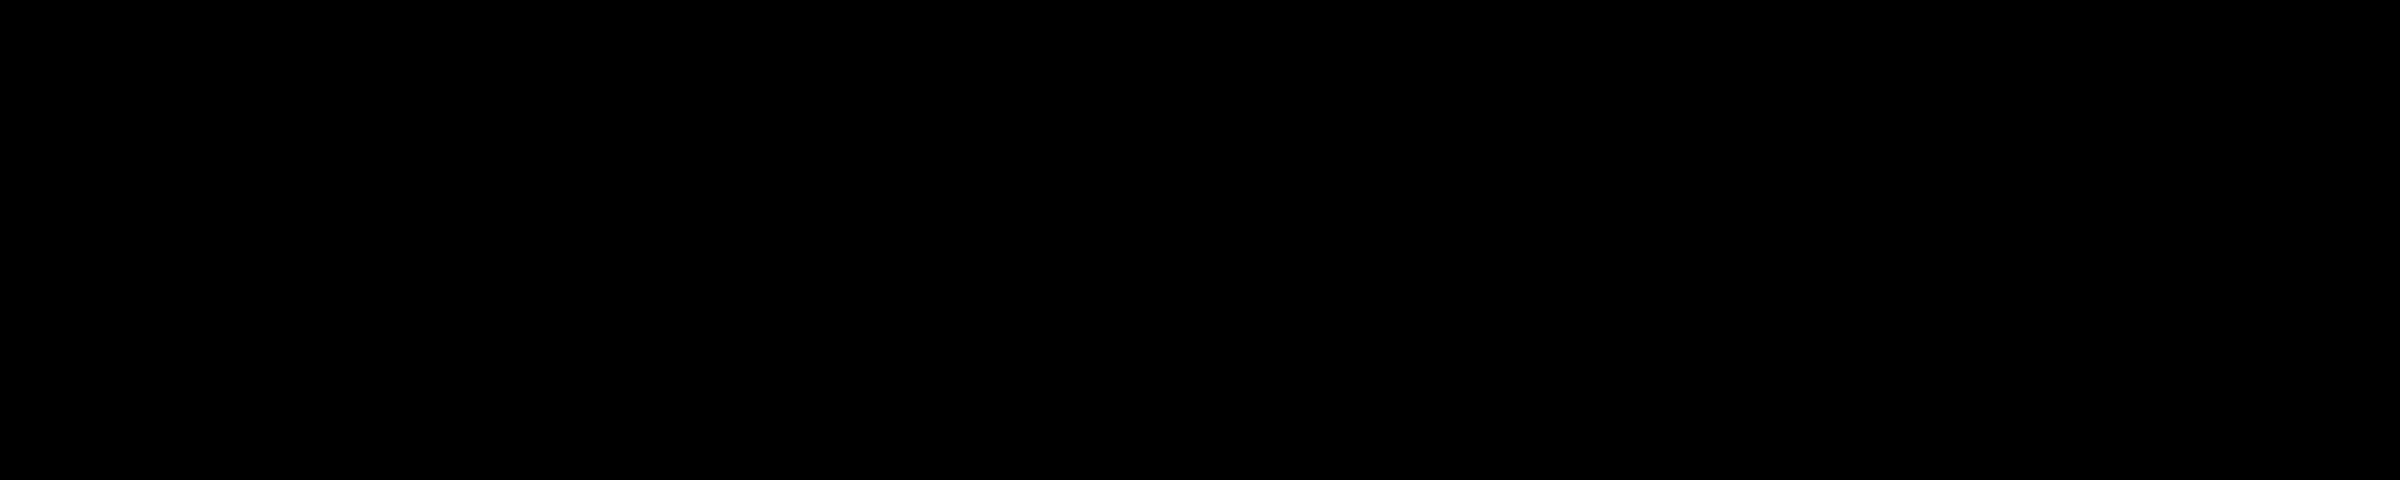 Clipart - Muster 43e Vierarmiger Stern gestreckt - Bordüre